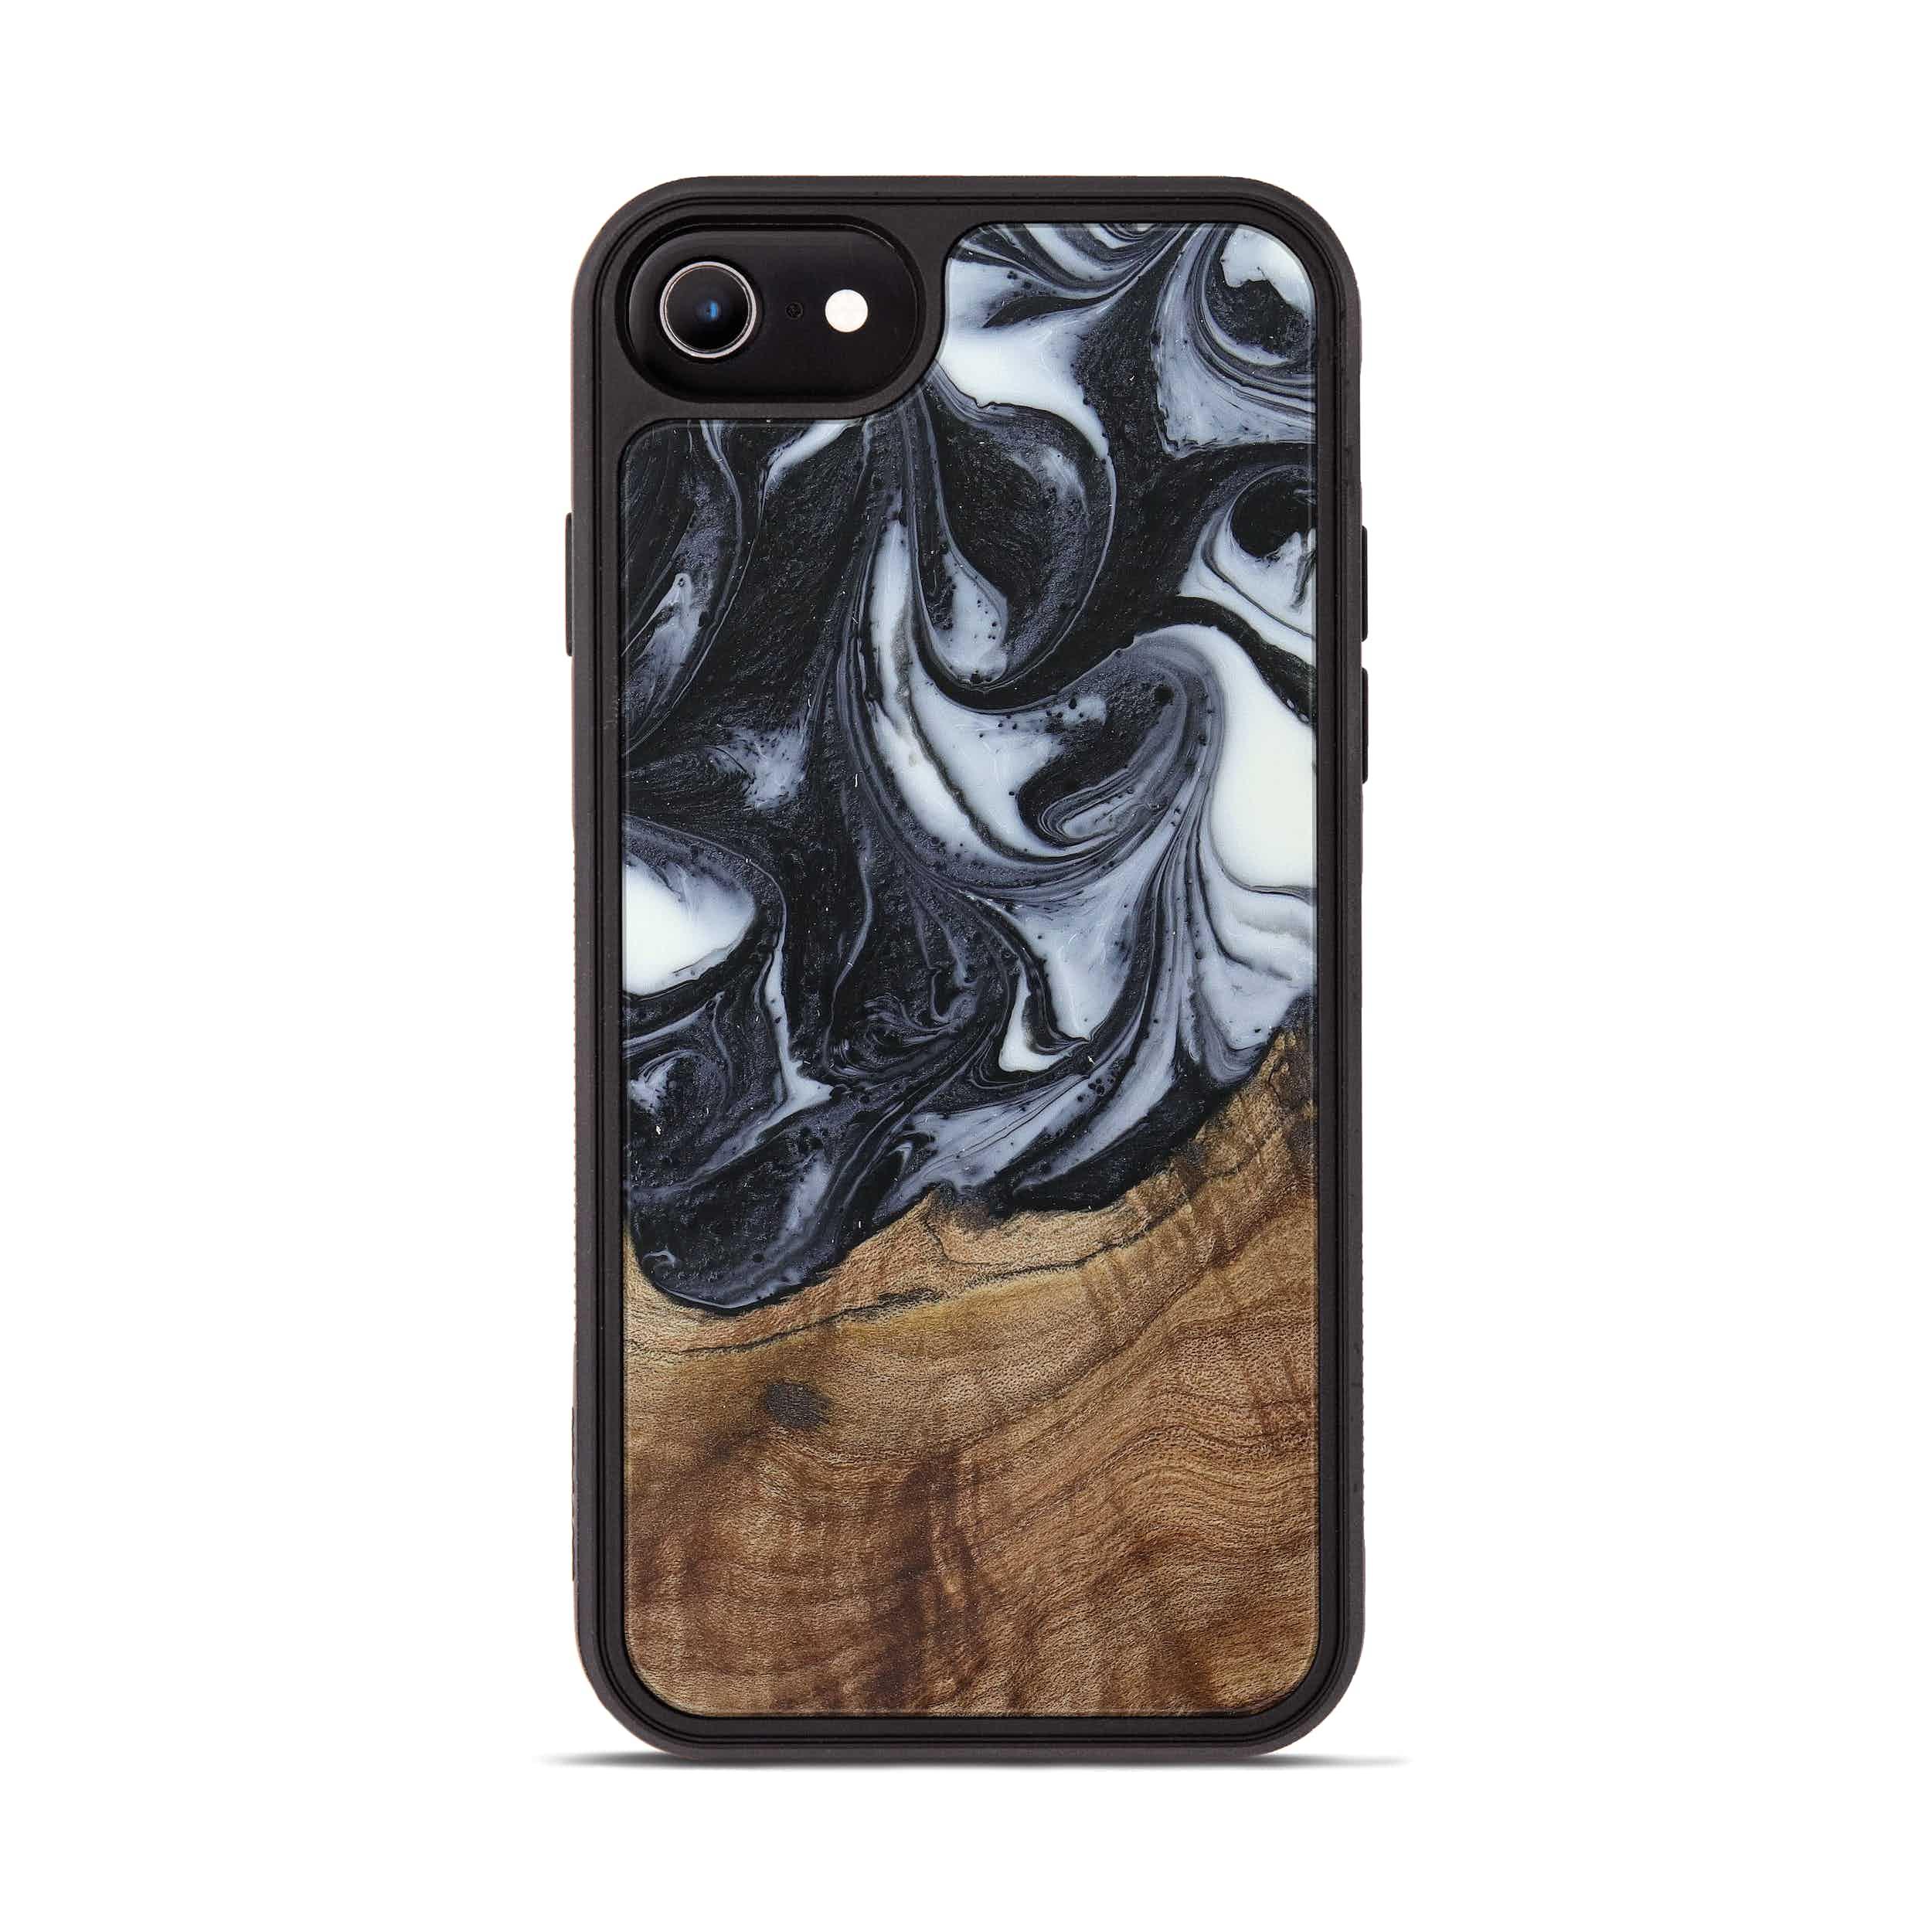 iPhone 8 Wood+Resin Phone Case - Christie (Black & White, 388765)